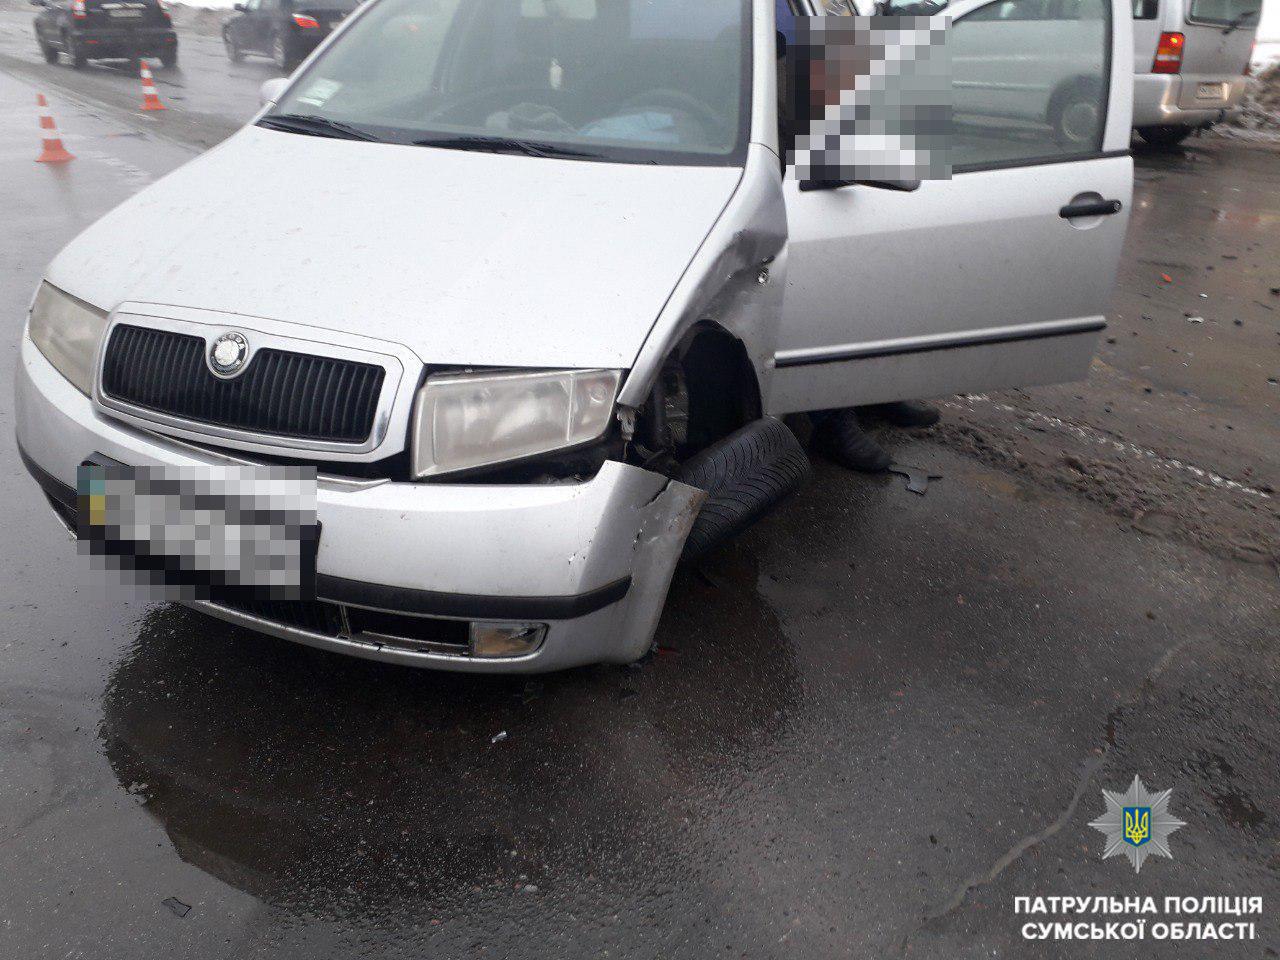 В Сумах произошло ДТП: пострадала 3-летняя пассажирка, фото-2